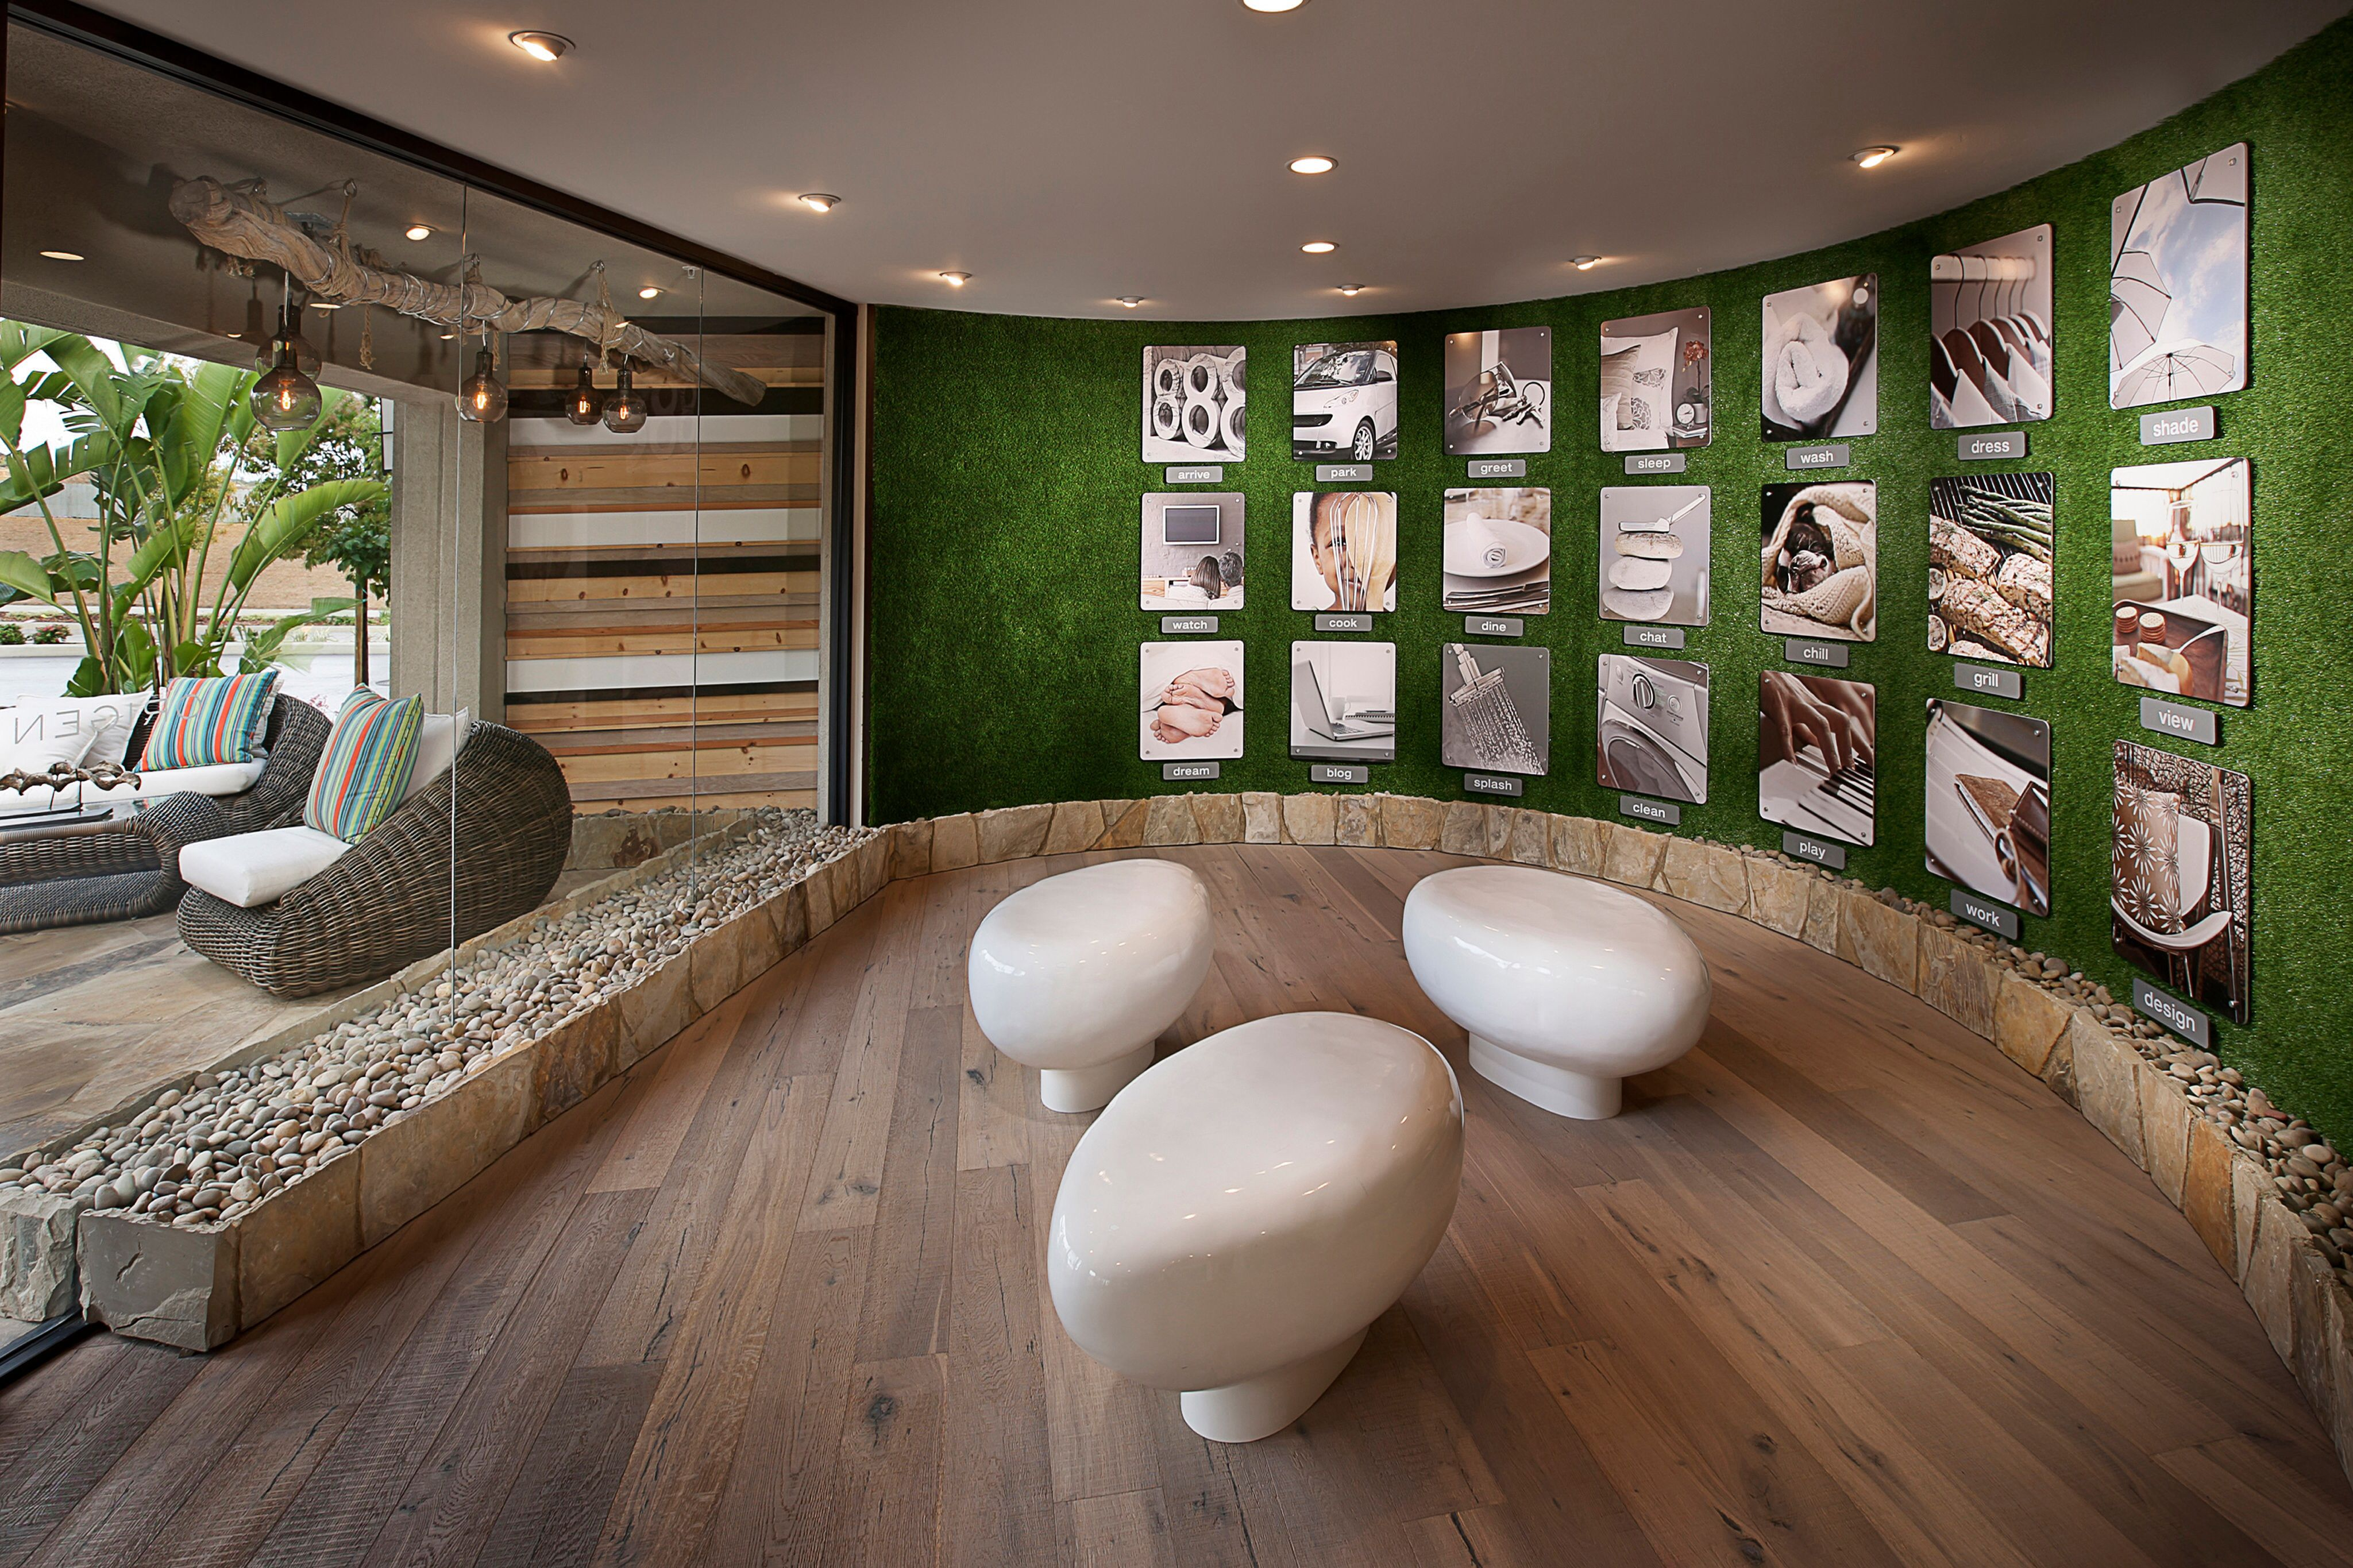 Origen Sales fice for Shea Homes San Diego by Design Line